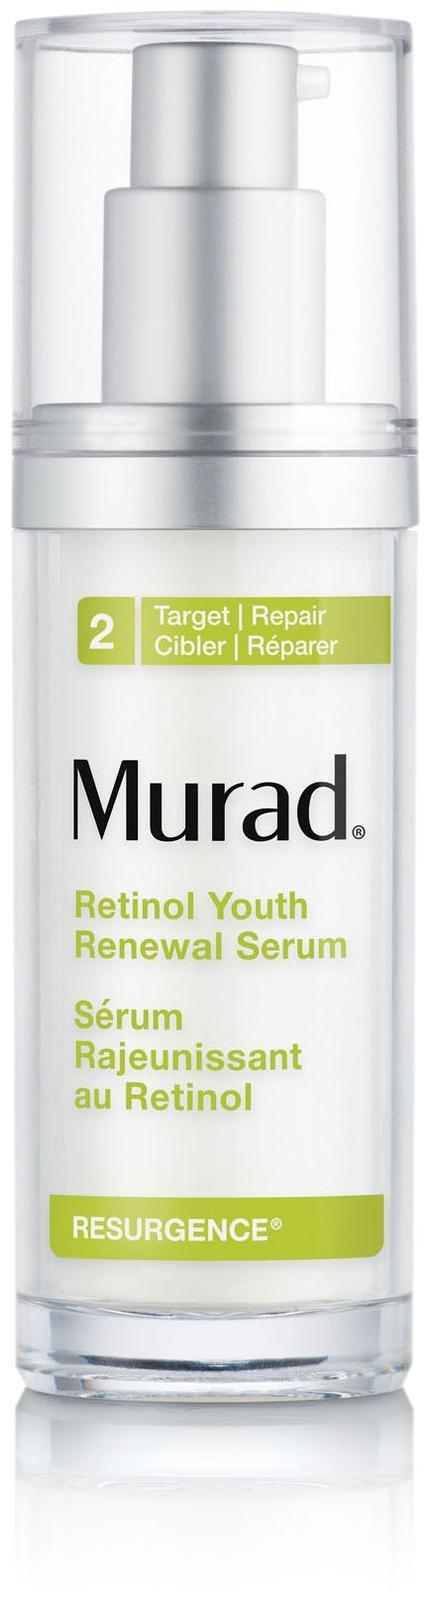 Murad Retinol Youth Renewal Serum - 1 Oz